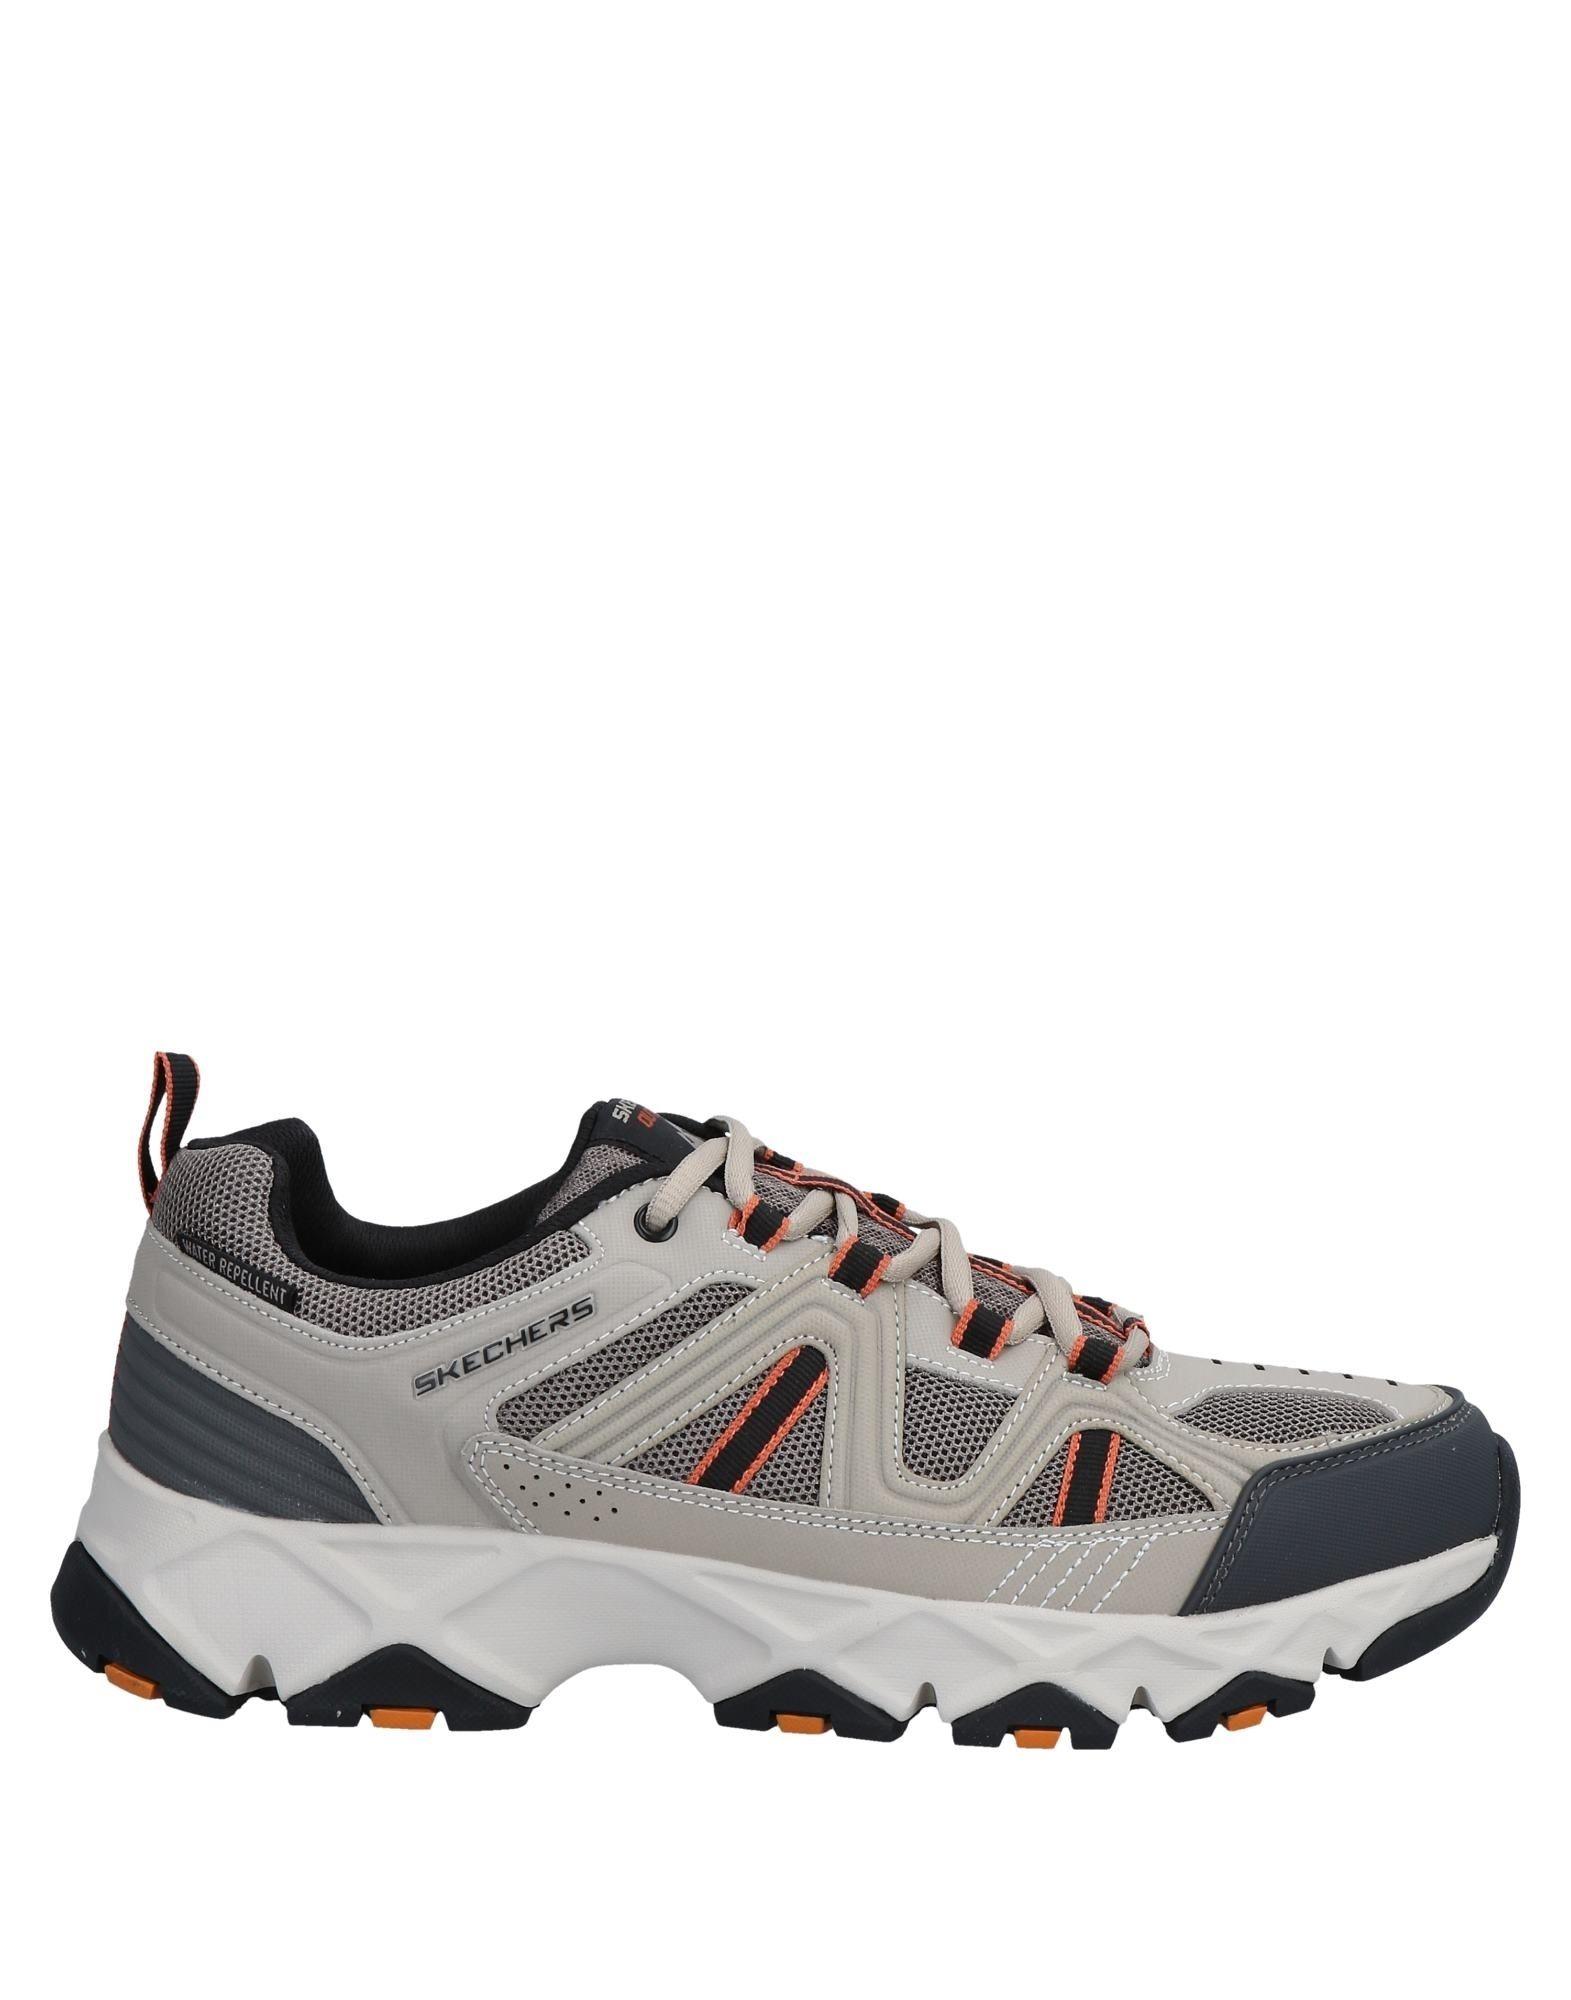 b0359d4e Skechers Sneakers - Men Skechers Sneakers online on YOOX United States -  11580773KF